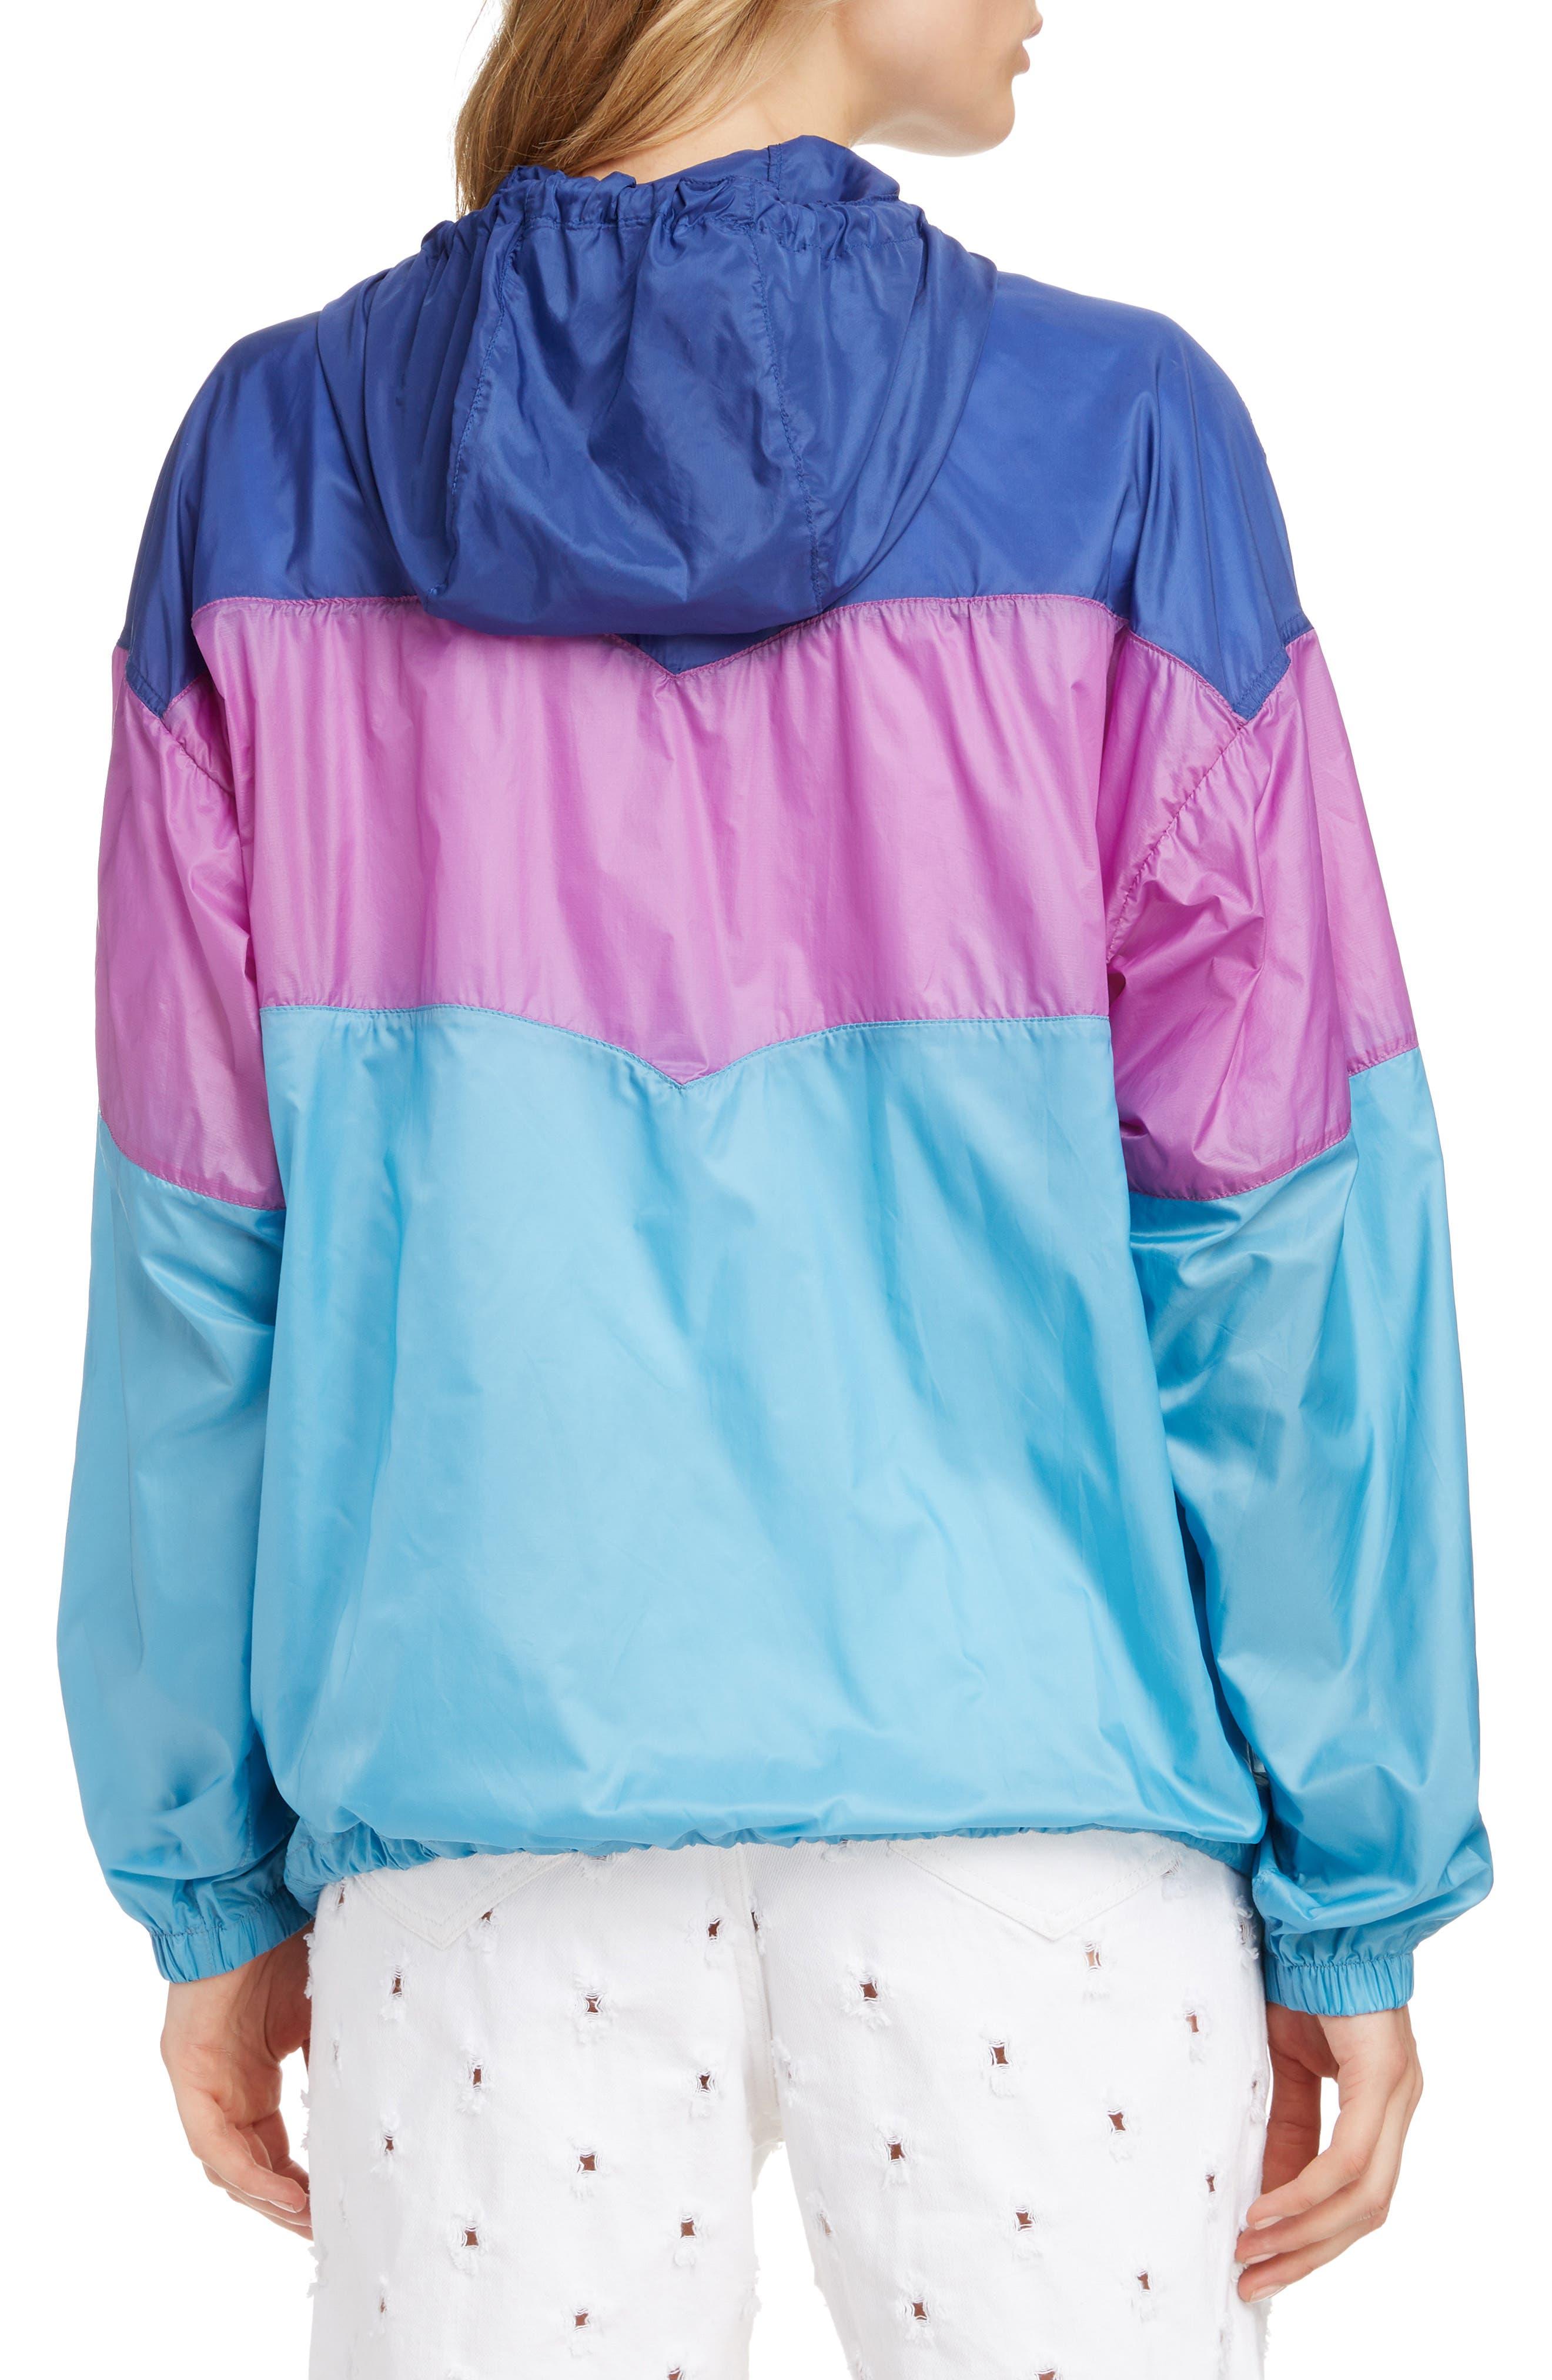 ISABEL MARANT ÉTOILE, Kyriel Colorblock Hooded Jacket, Alternate thumbnail 2, color, ELECTRIC BLUE/ VIOLET